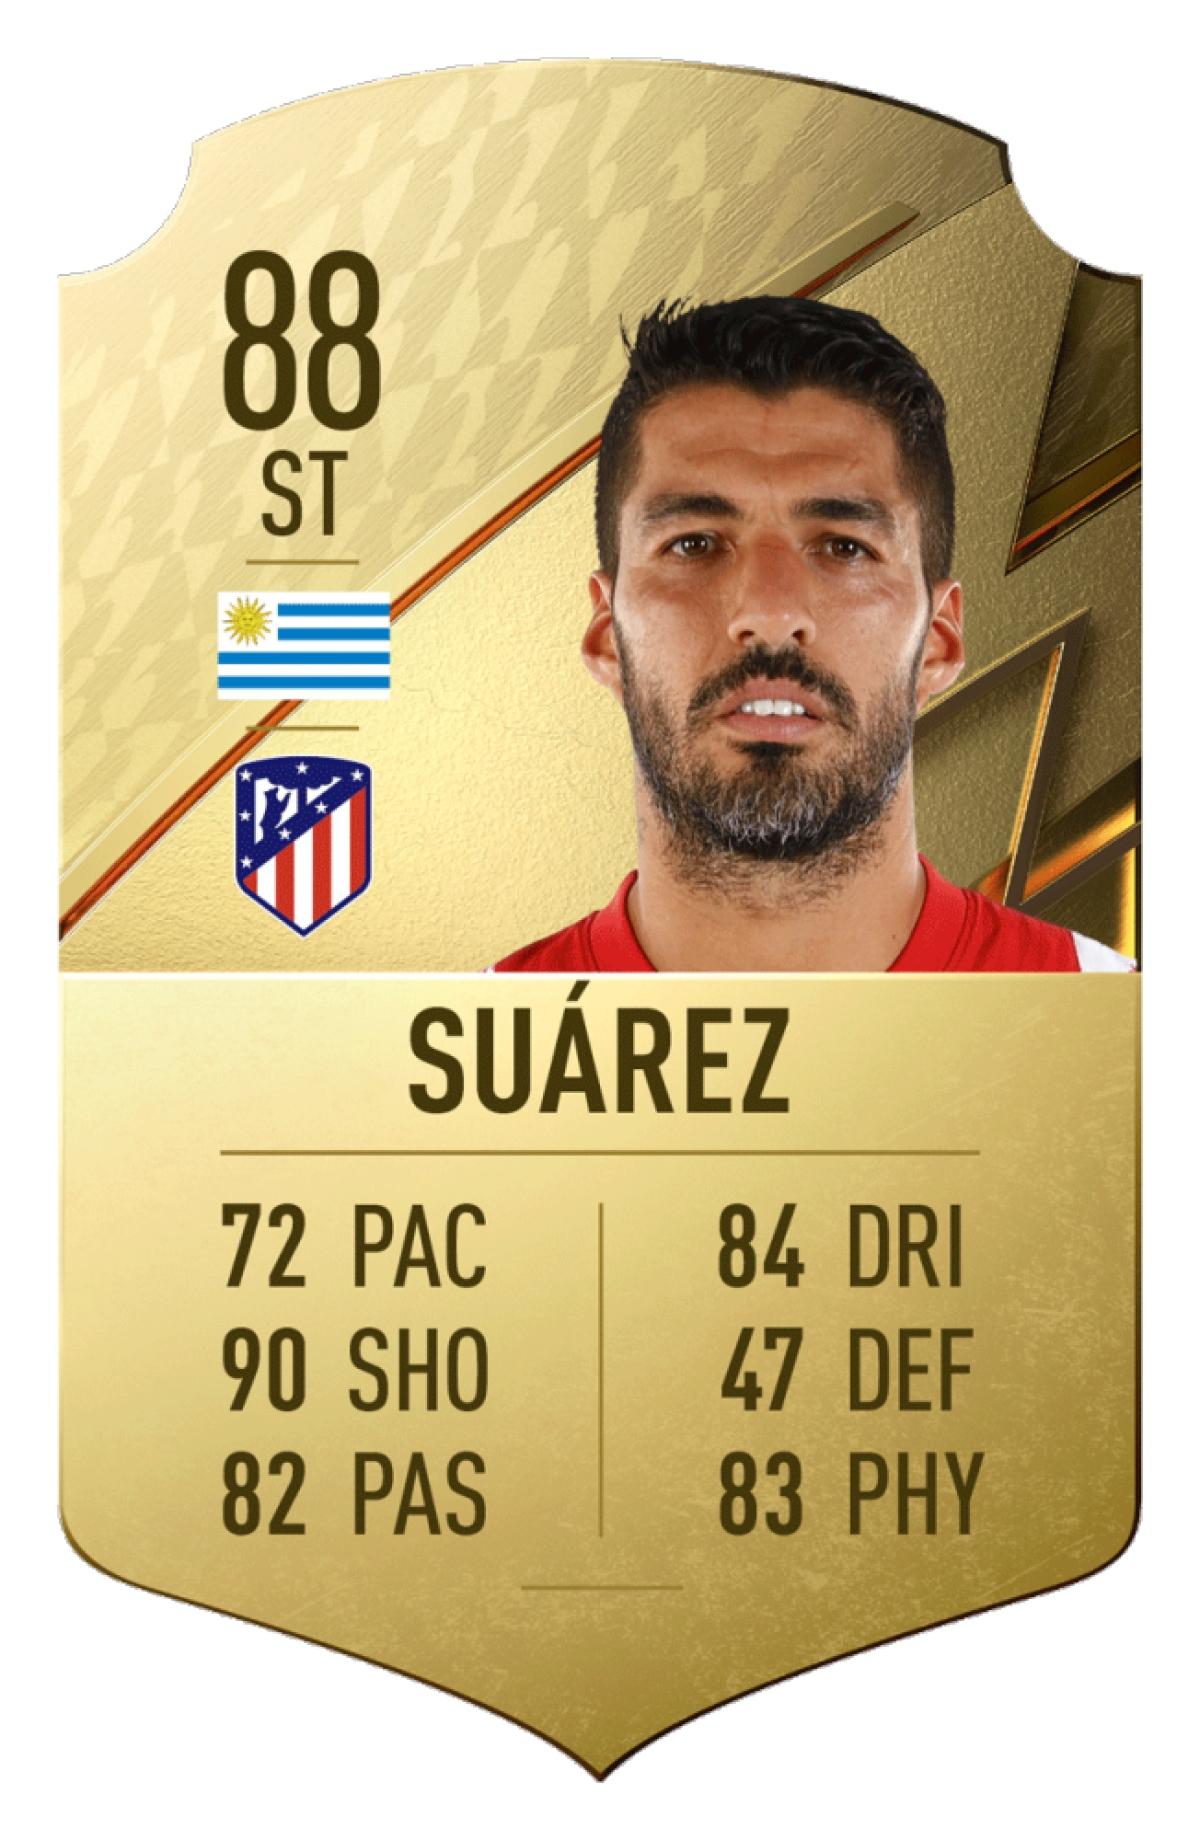 6. Luis Suarez | Atletico Madrid | Chỉ số tổng quan: 88